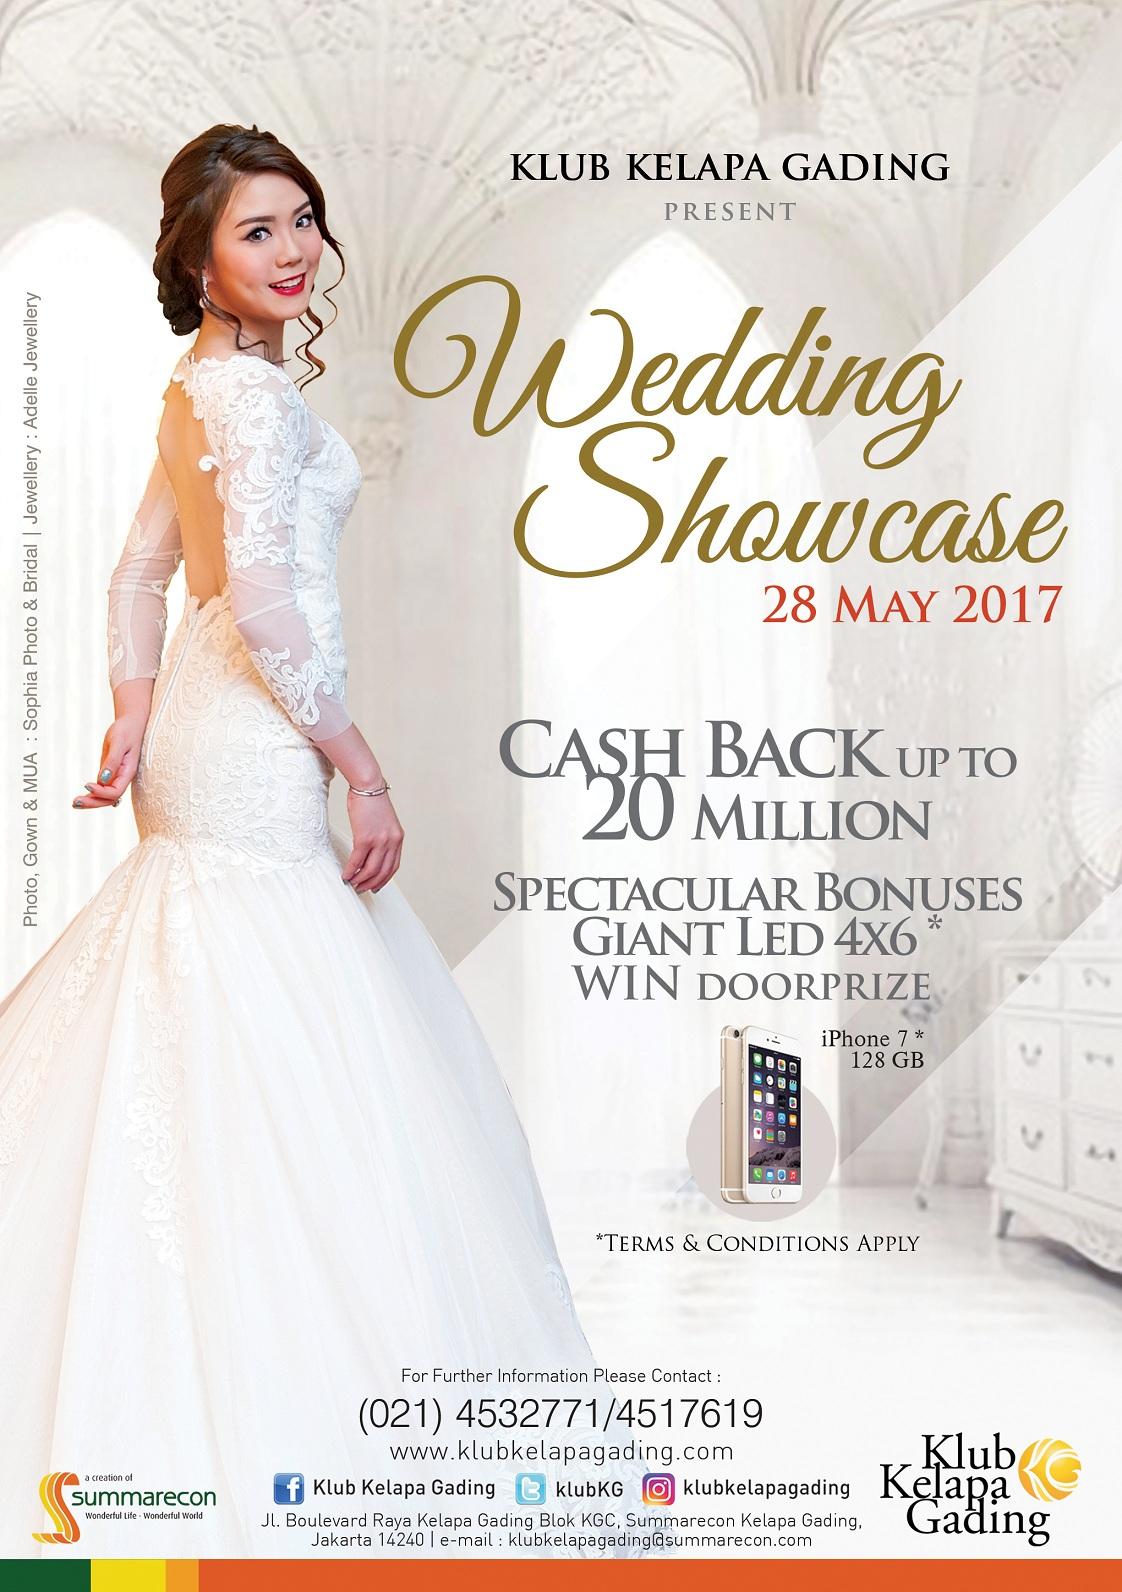 Wedding-Showcase-28-May-2017_C-RGB